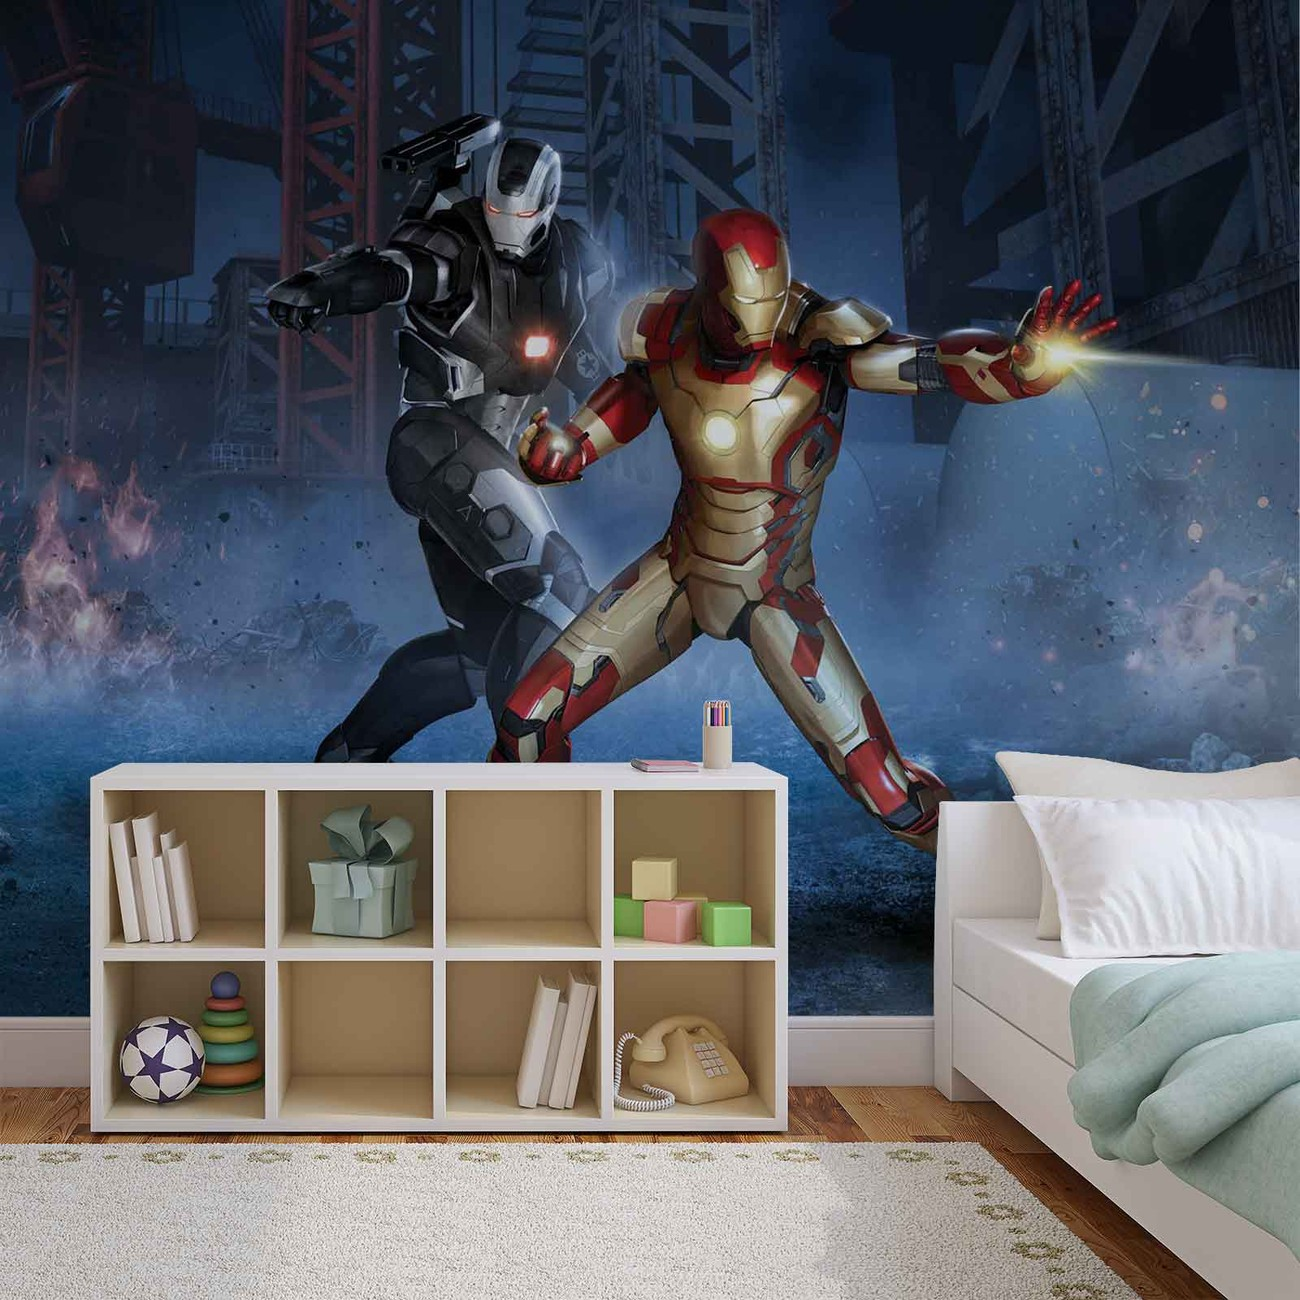 Iron Man EndGame Wall Art Marvel Comics Wall Mural Avengers Wallpaper I Love You 3000 Self Adhesive Wallpaper Peel and Stick Wallpaper X292